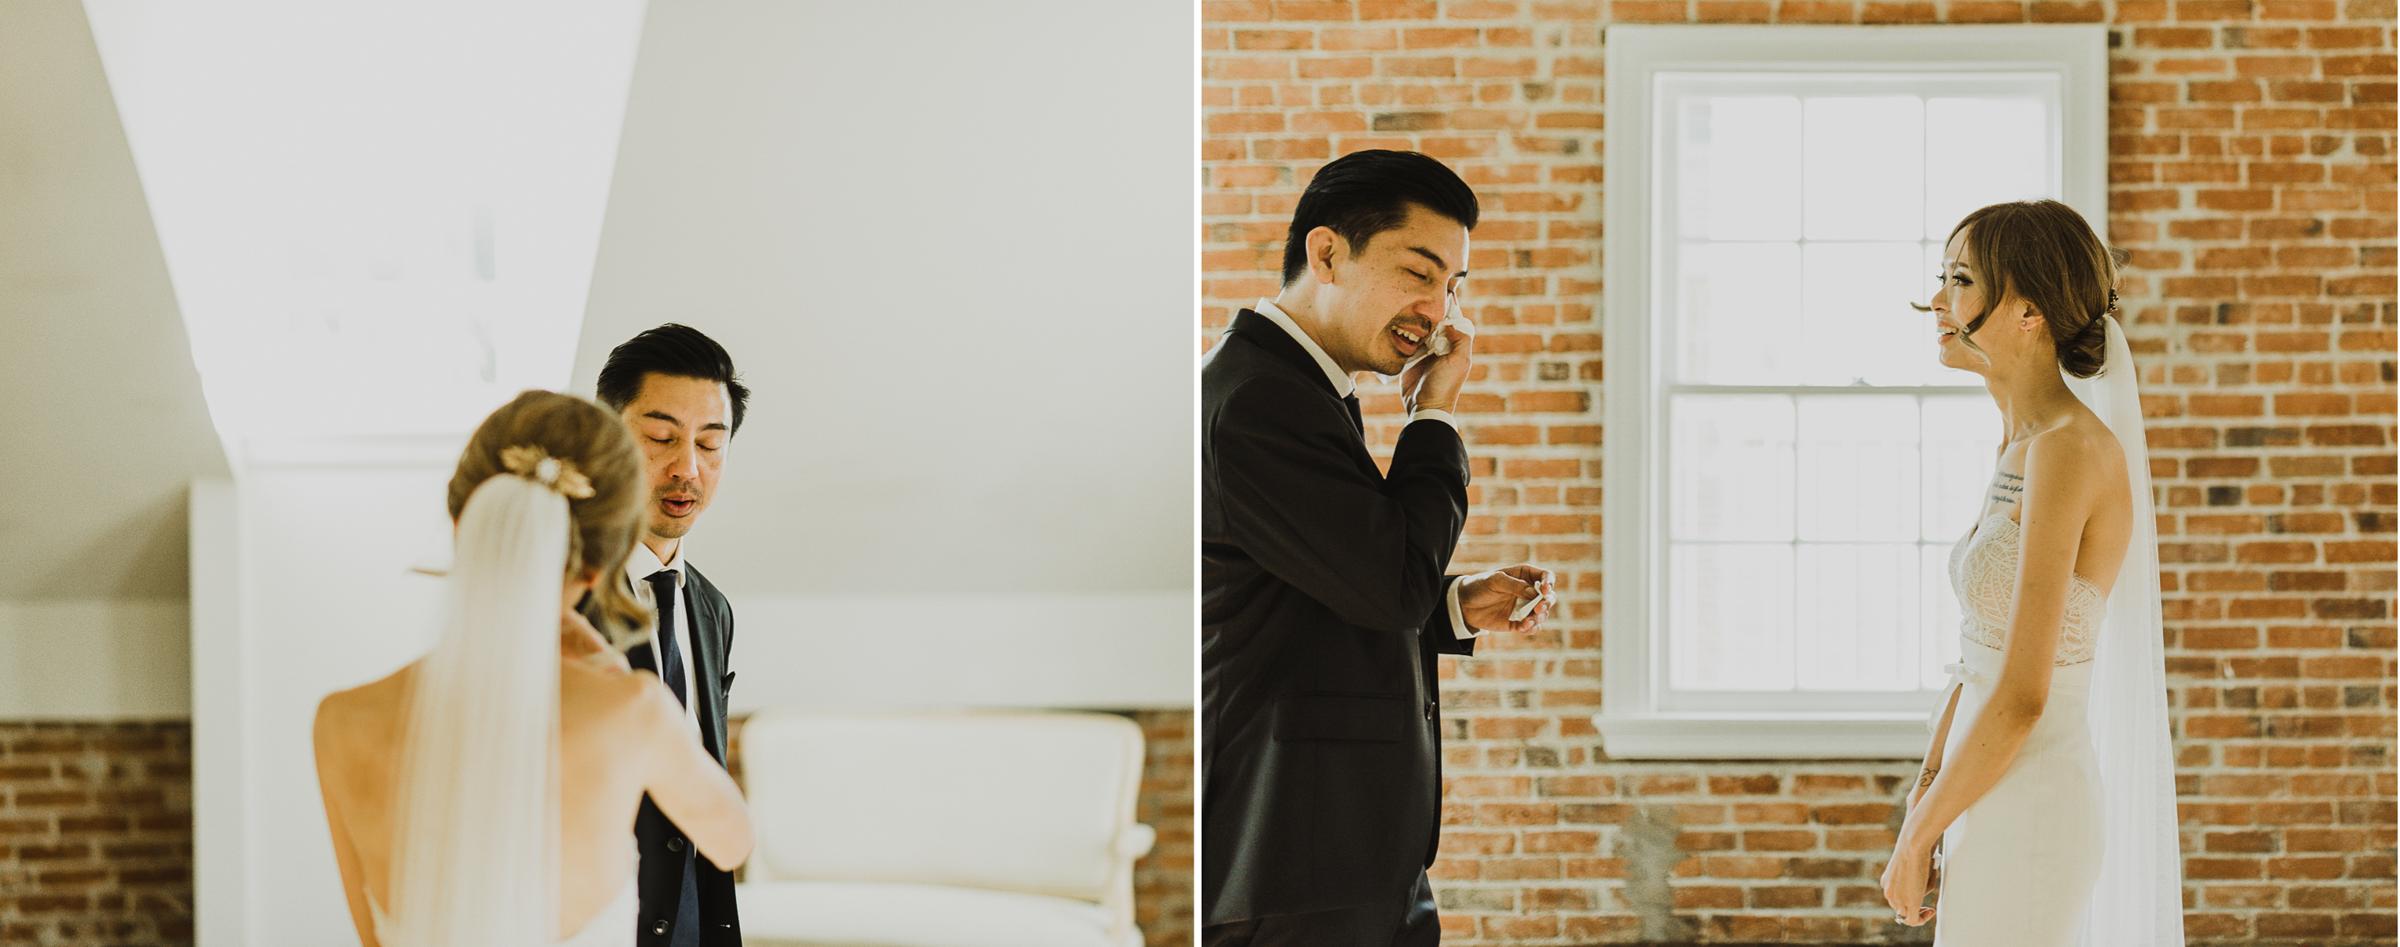 ©Isaiah + Taylor Photography - The Estate On Second Wedding, Santa Ana - Orange County Wedding Photographer-31.jpg